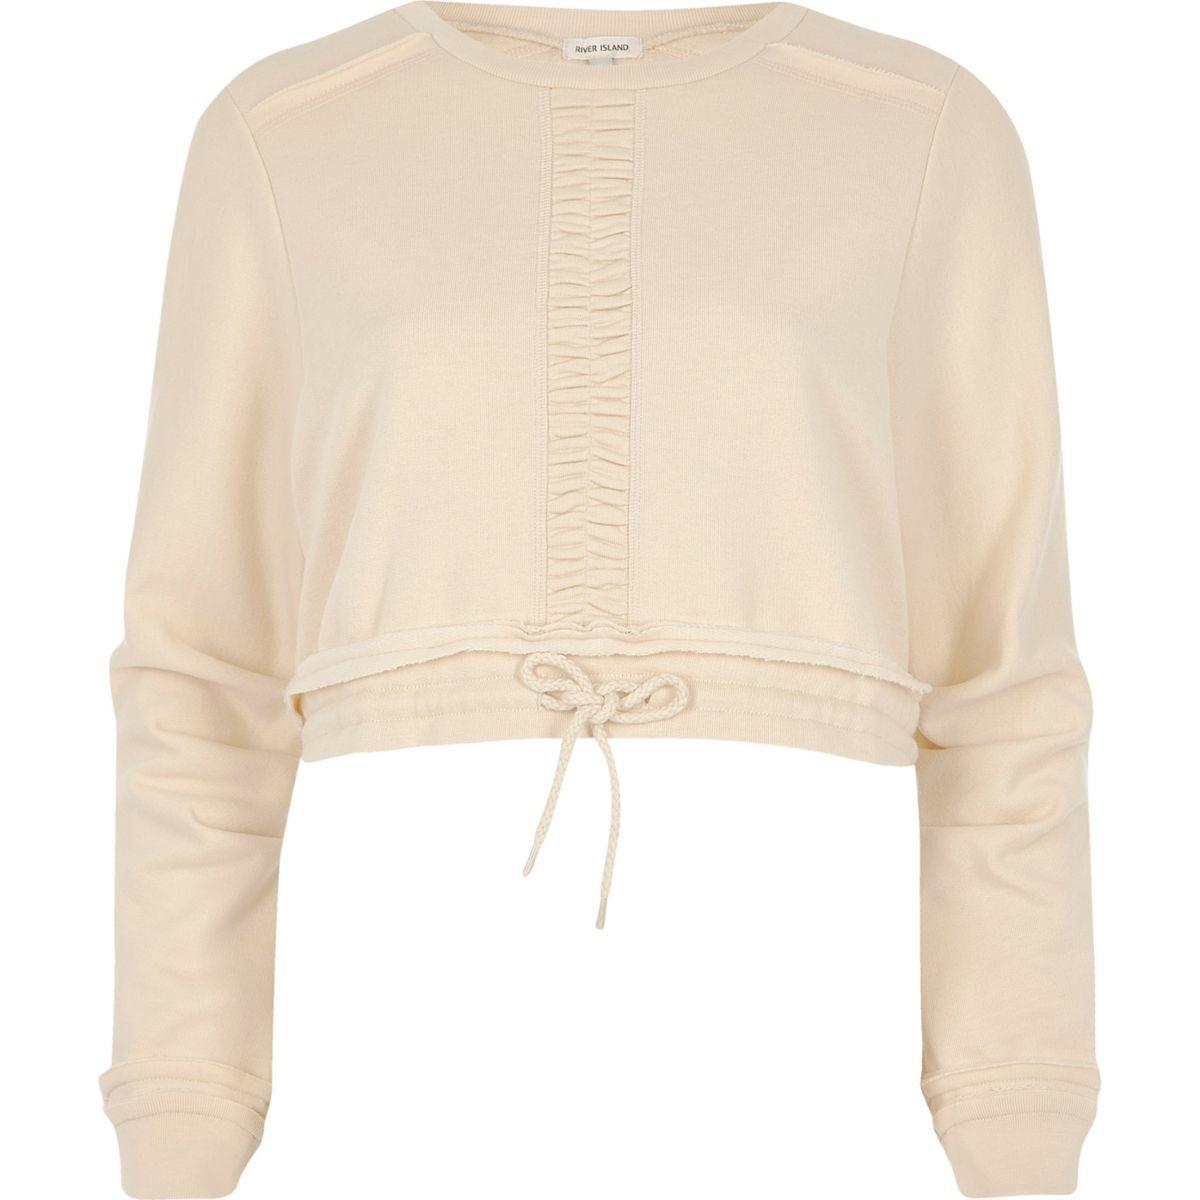 Hellbeiges, kurzes Sweatshirt